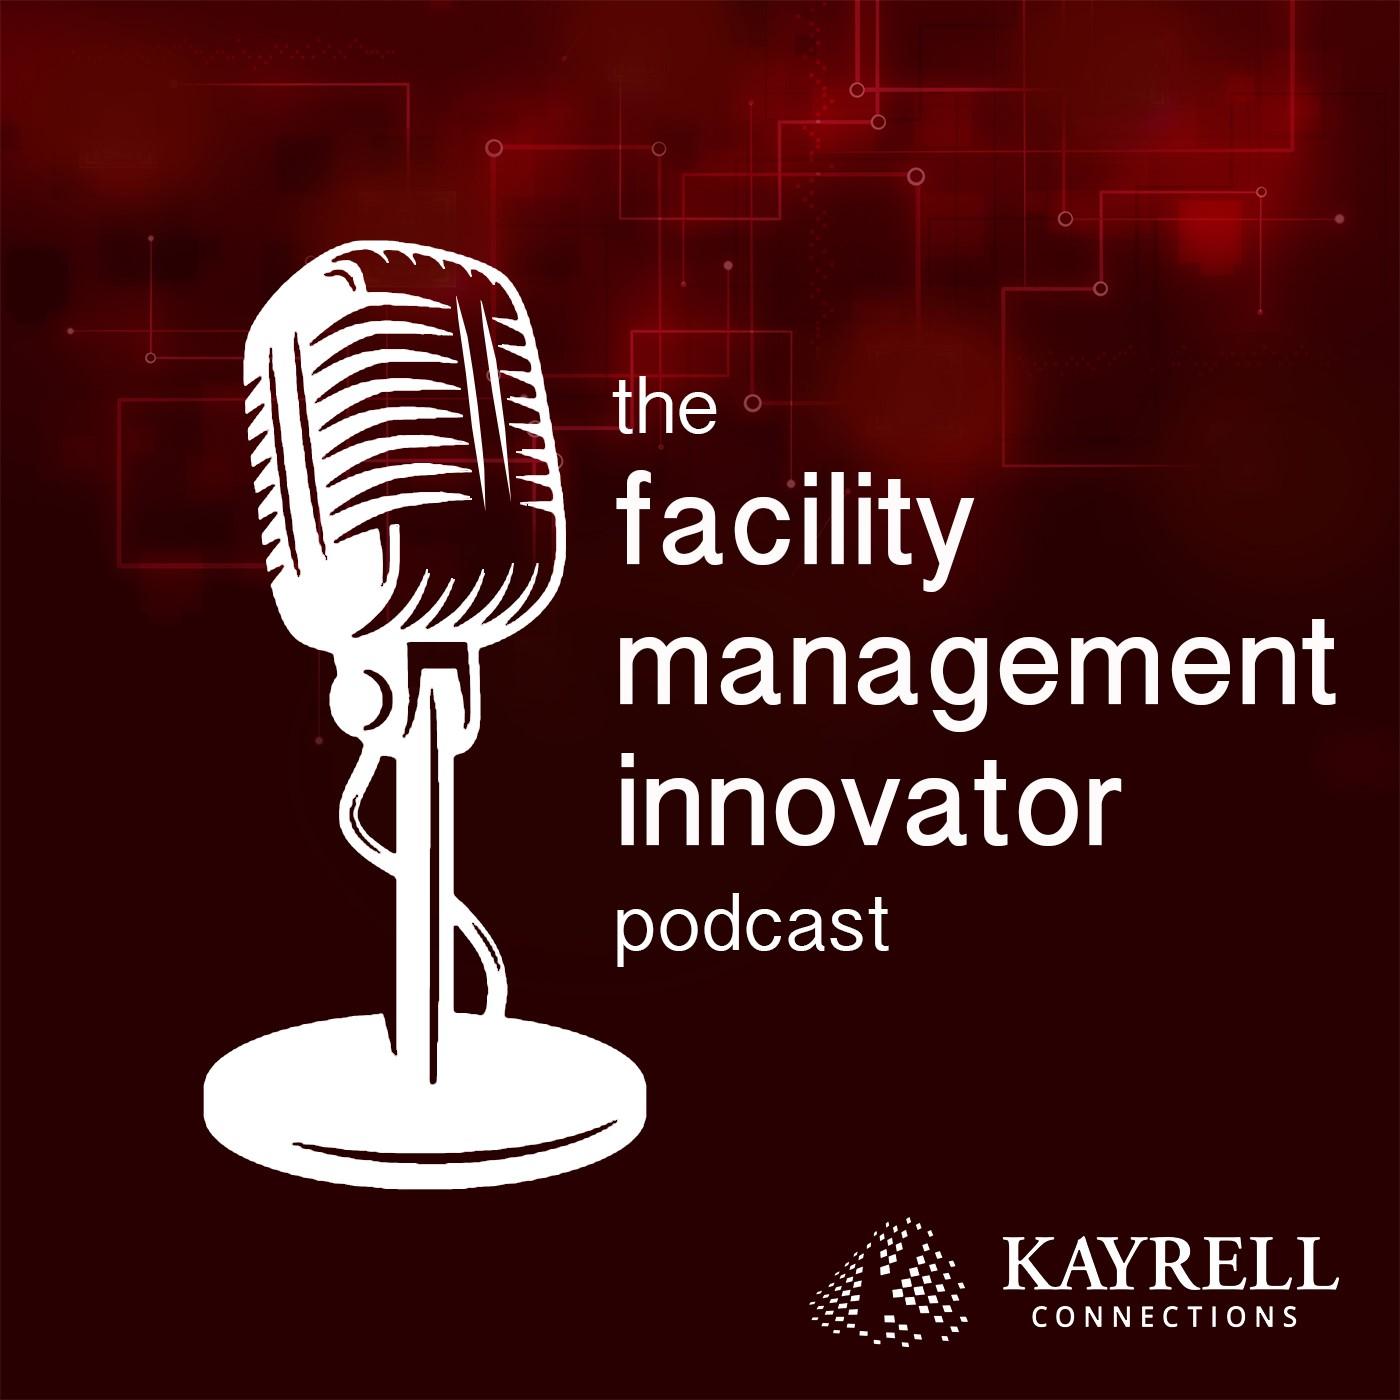 The Facility Management Innovator Podcast show art